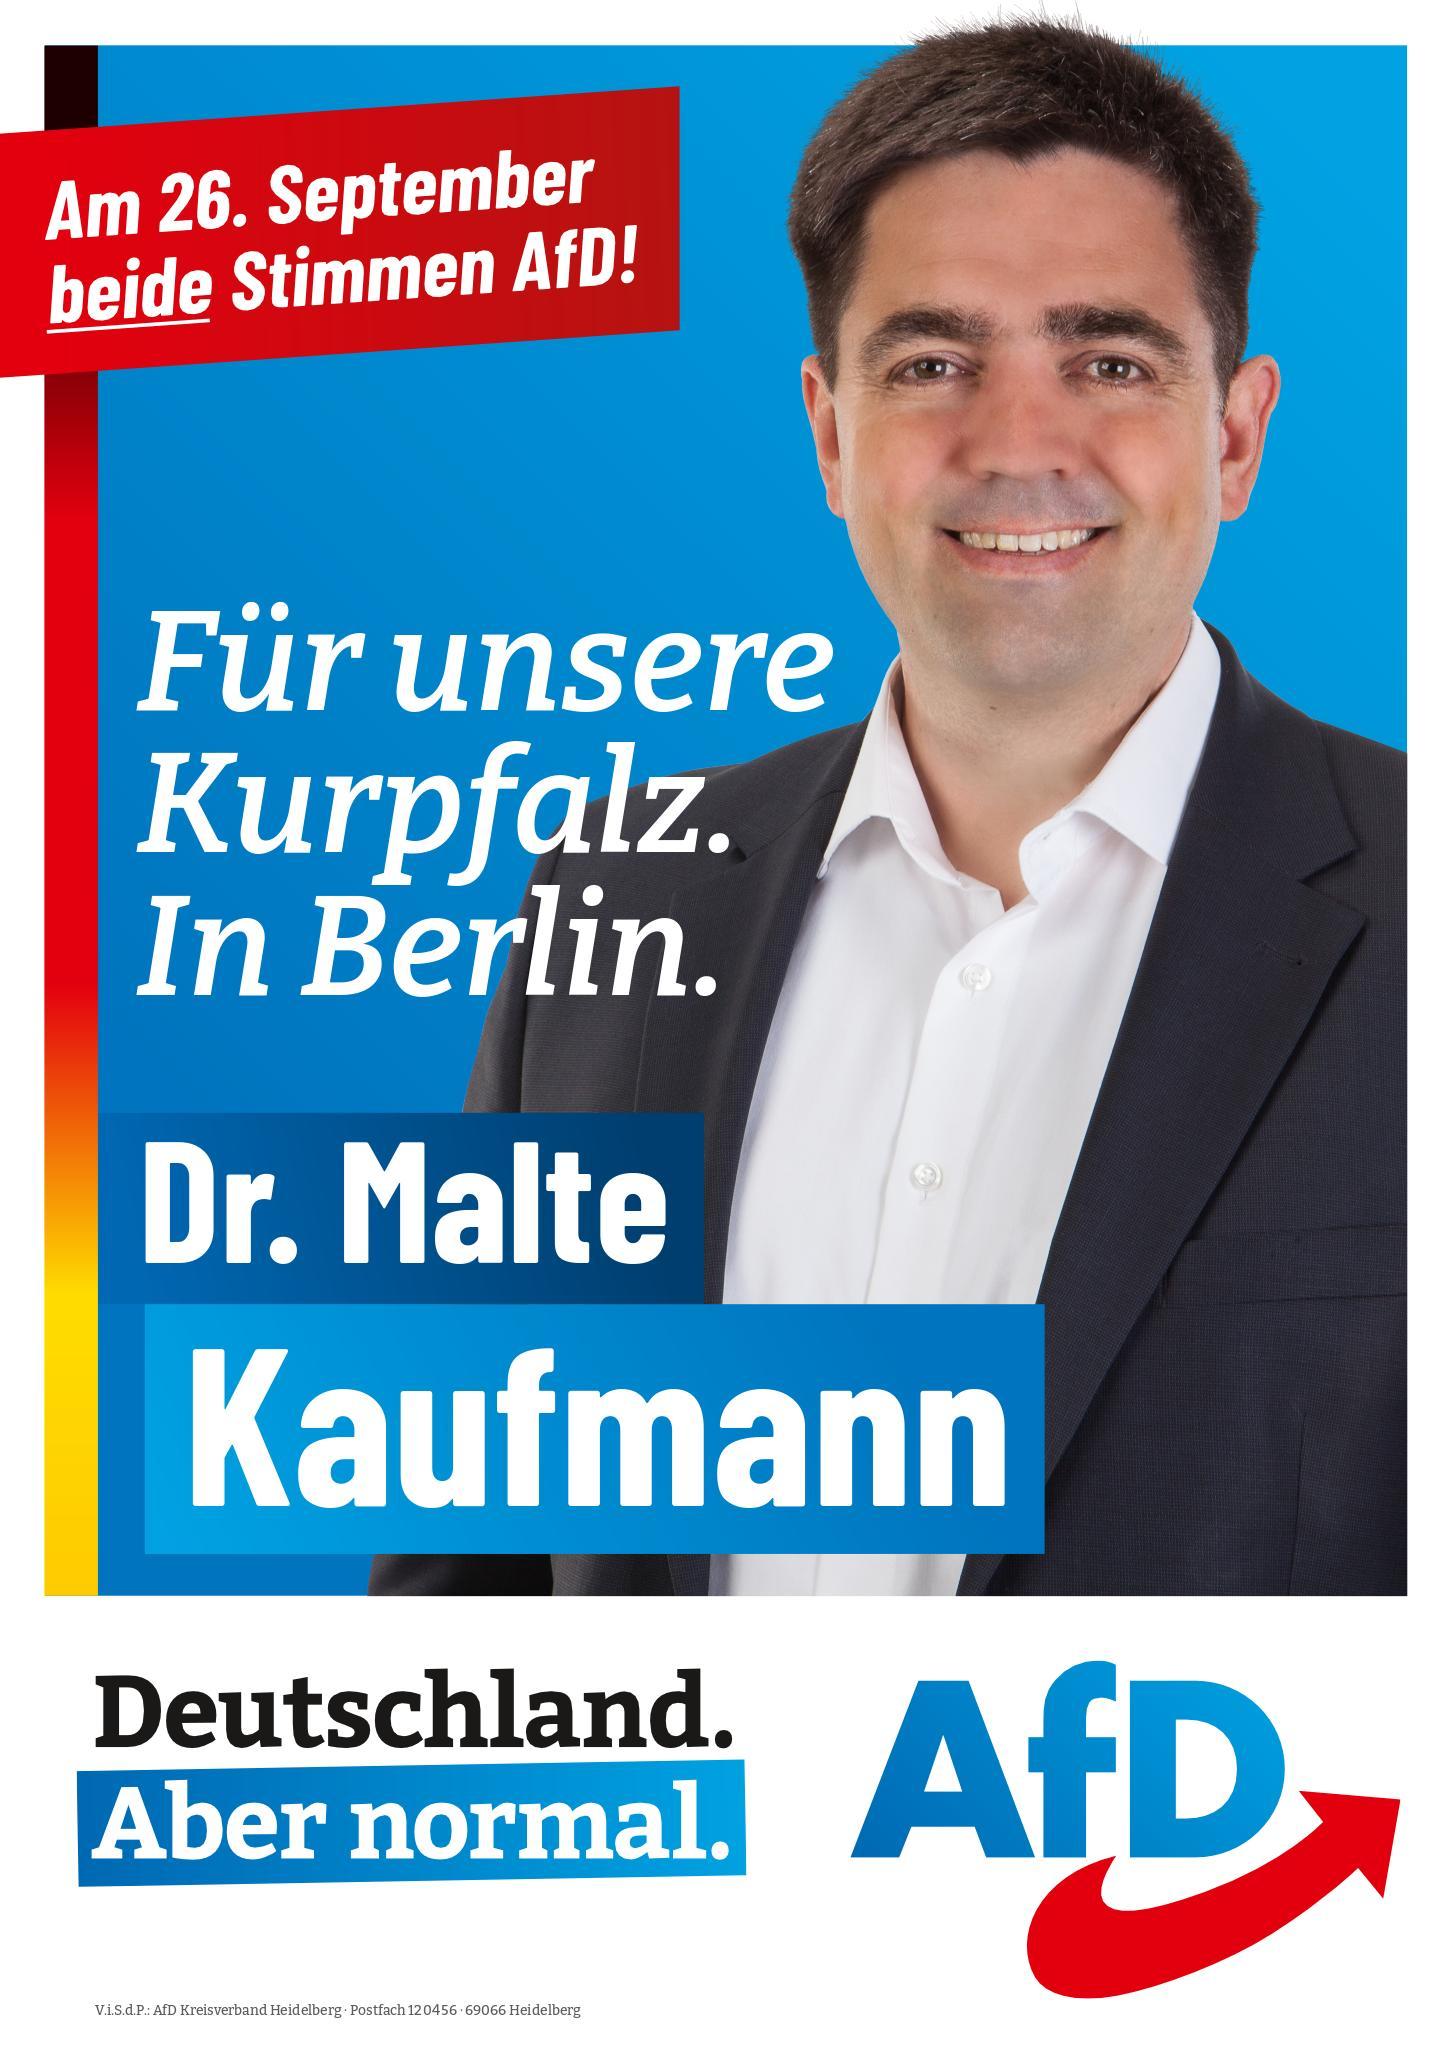 Malte_BTW21_Kurpfalz